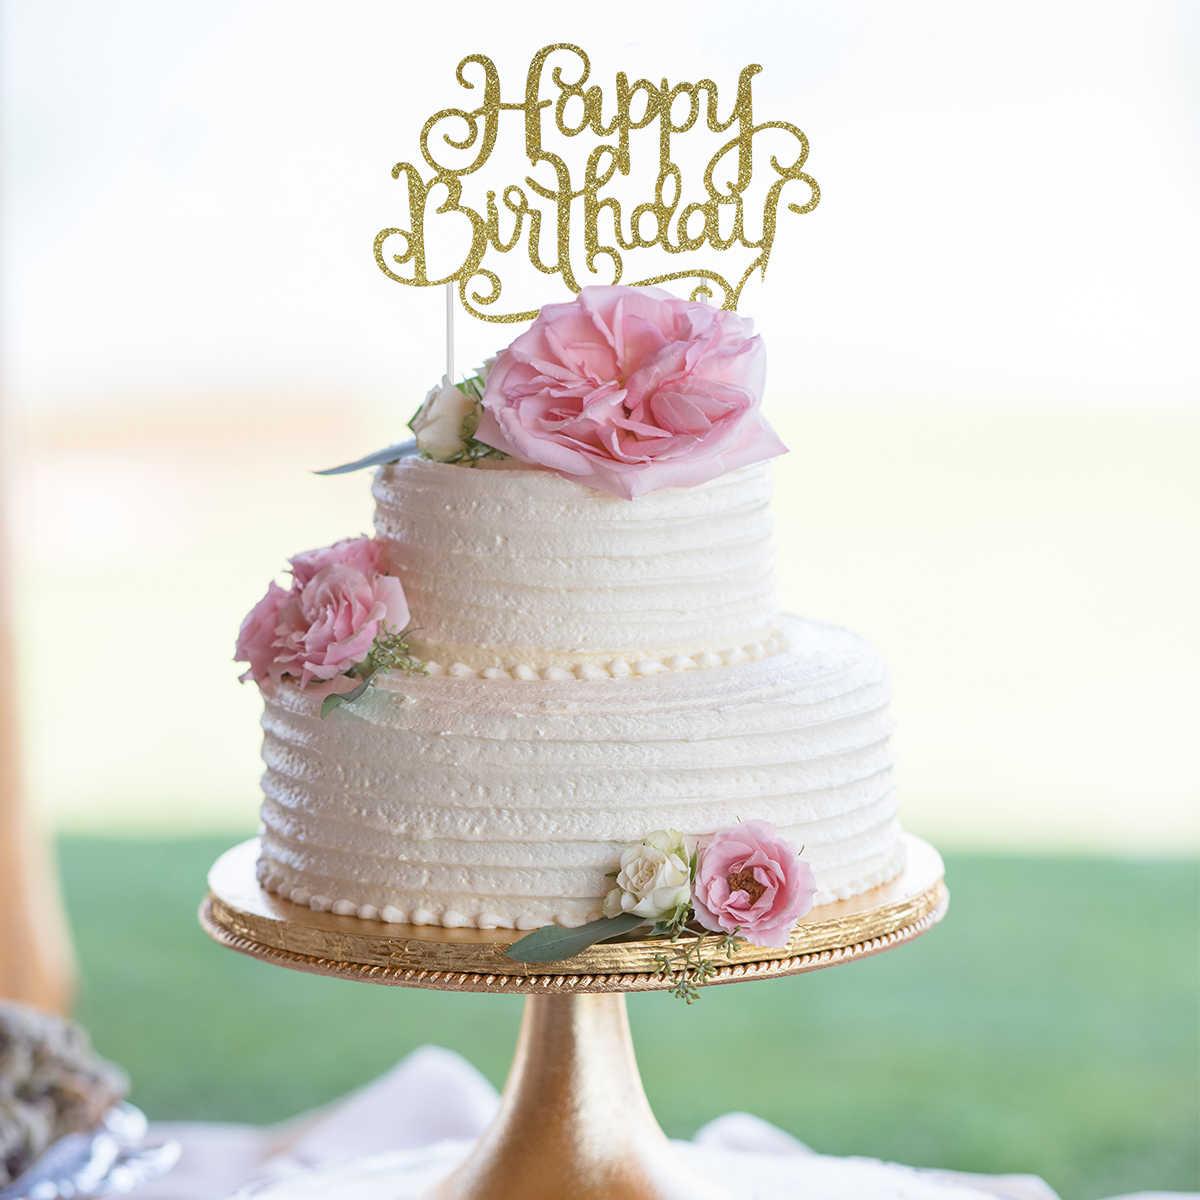 Admirable 10Pcs Glitter Happy Birthday Cake Topper Alternative Party Funny Birthday Cards Online Barepcheapnameinfo